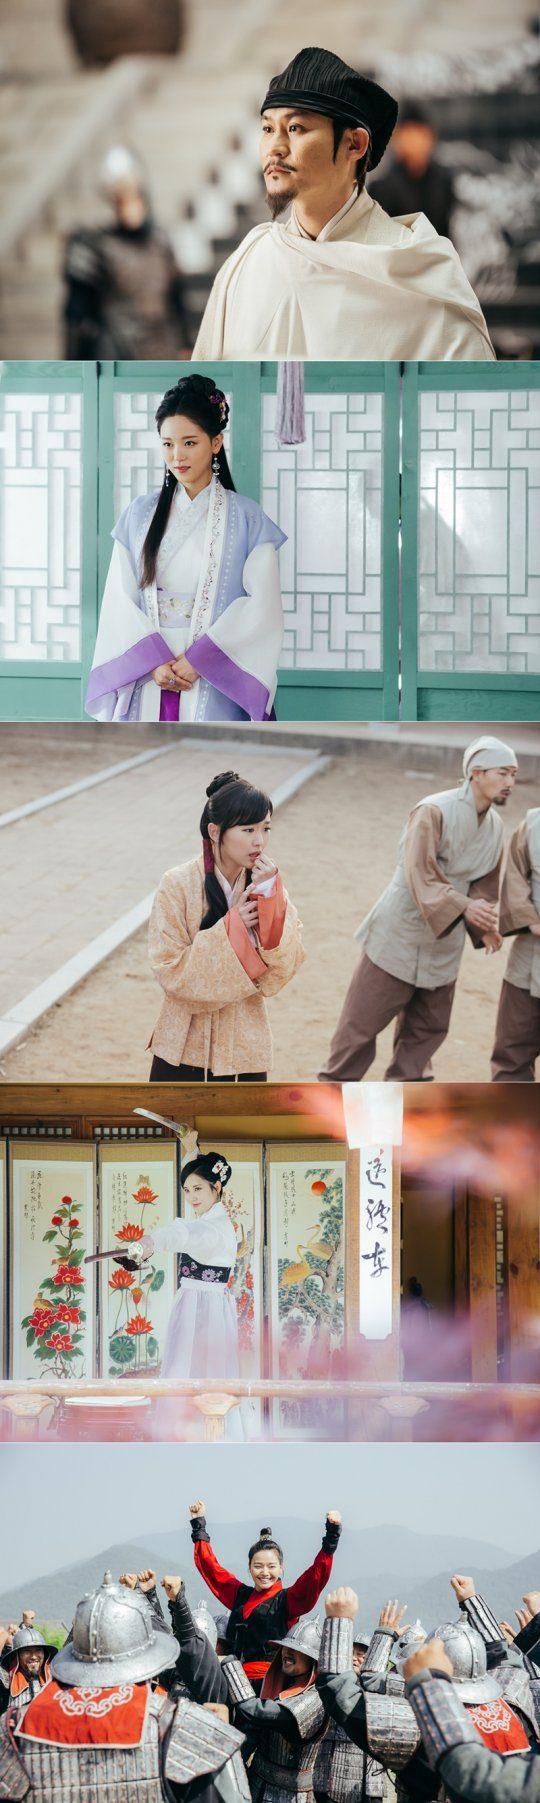 kim-sung-kyun-kang-han-na-ji-he-ra